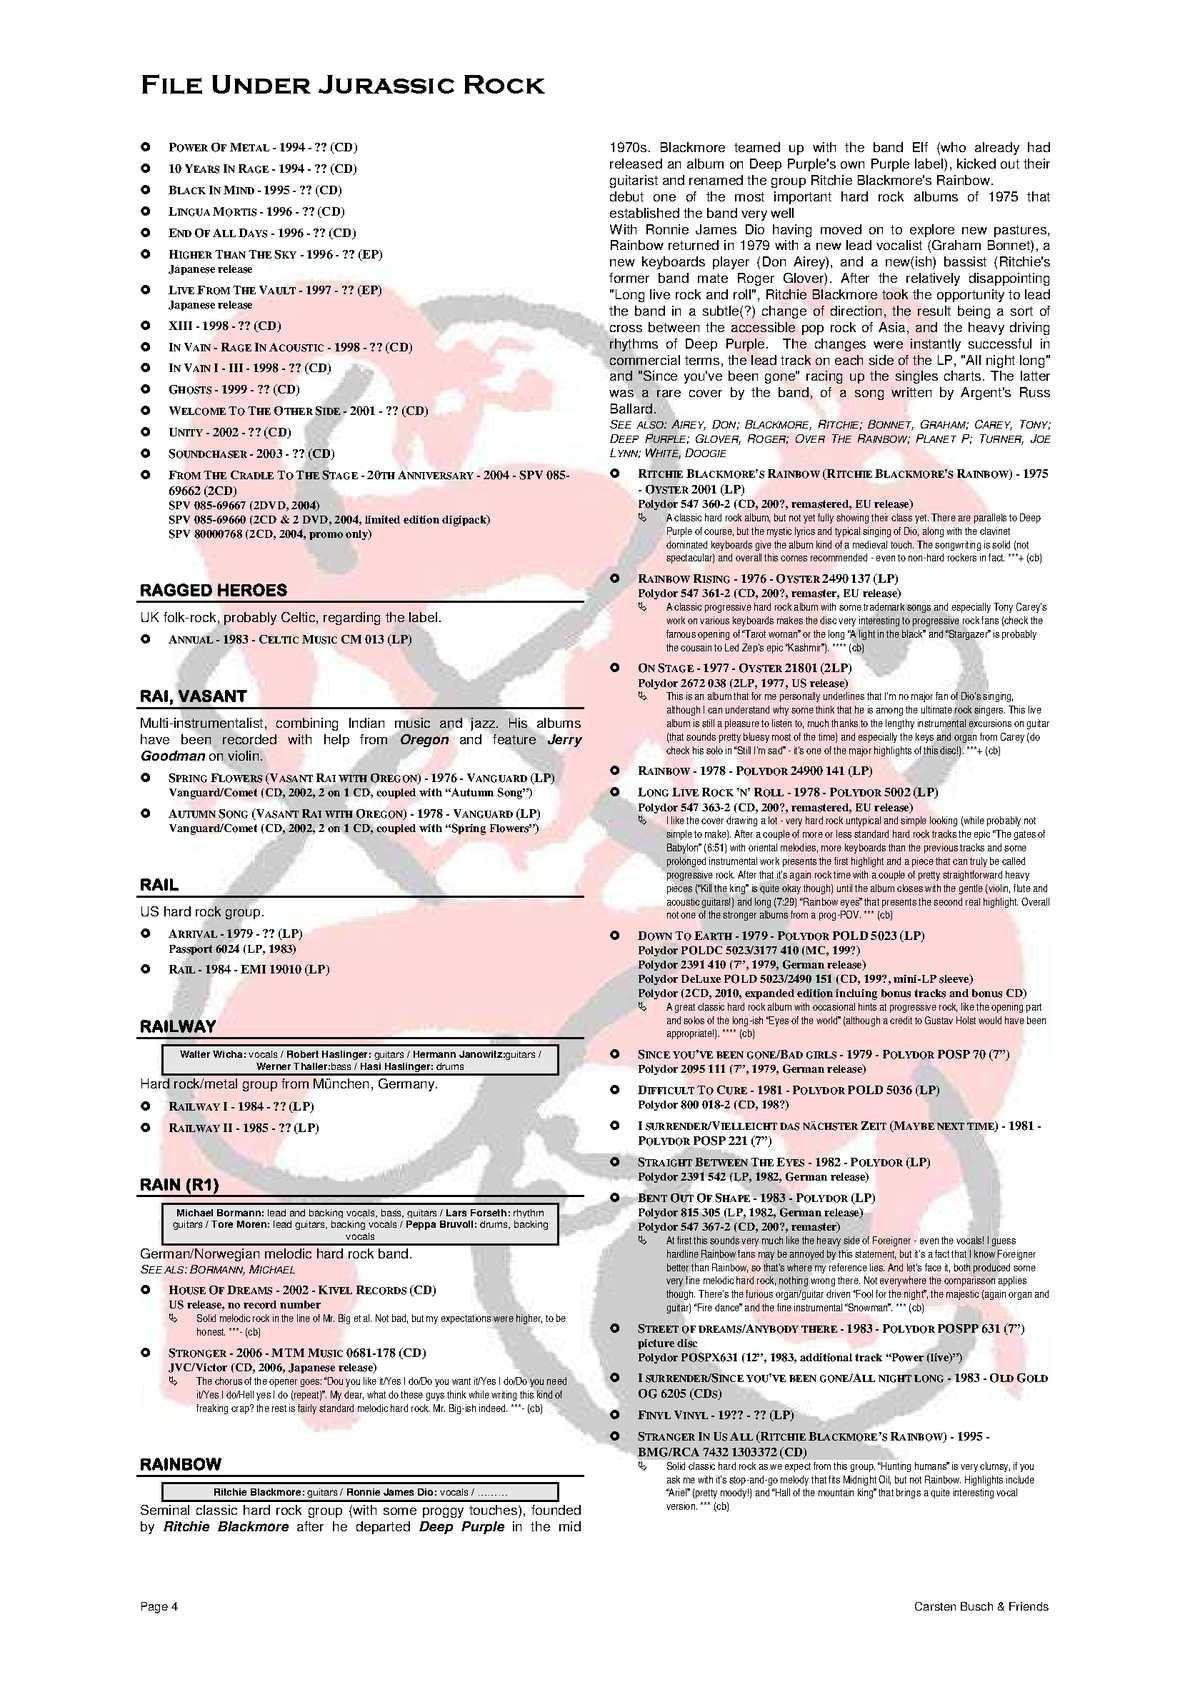 File Under Jurassic Rock - R Temporary (2015) - CALAMEO Downloader